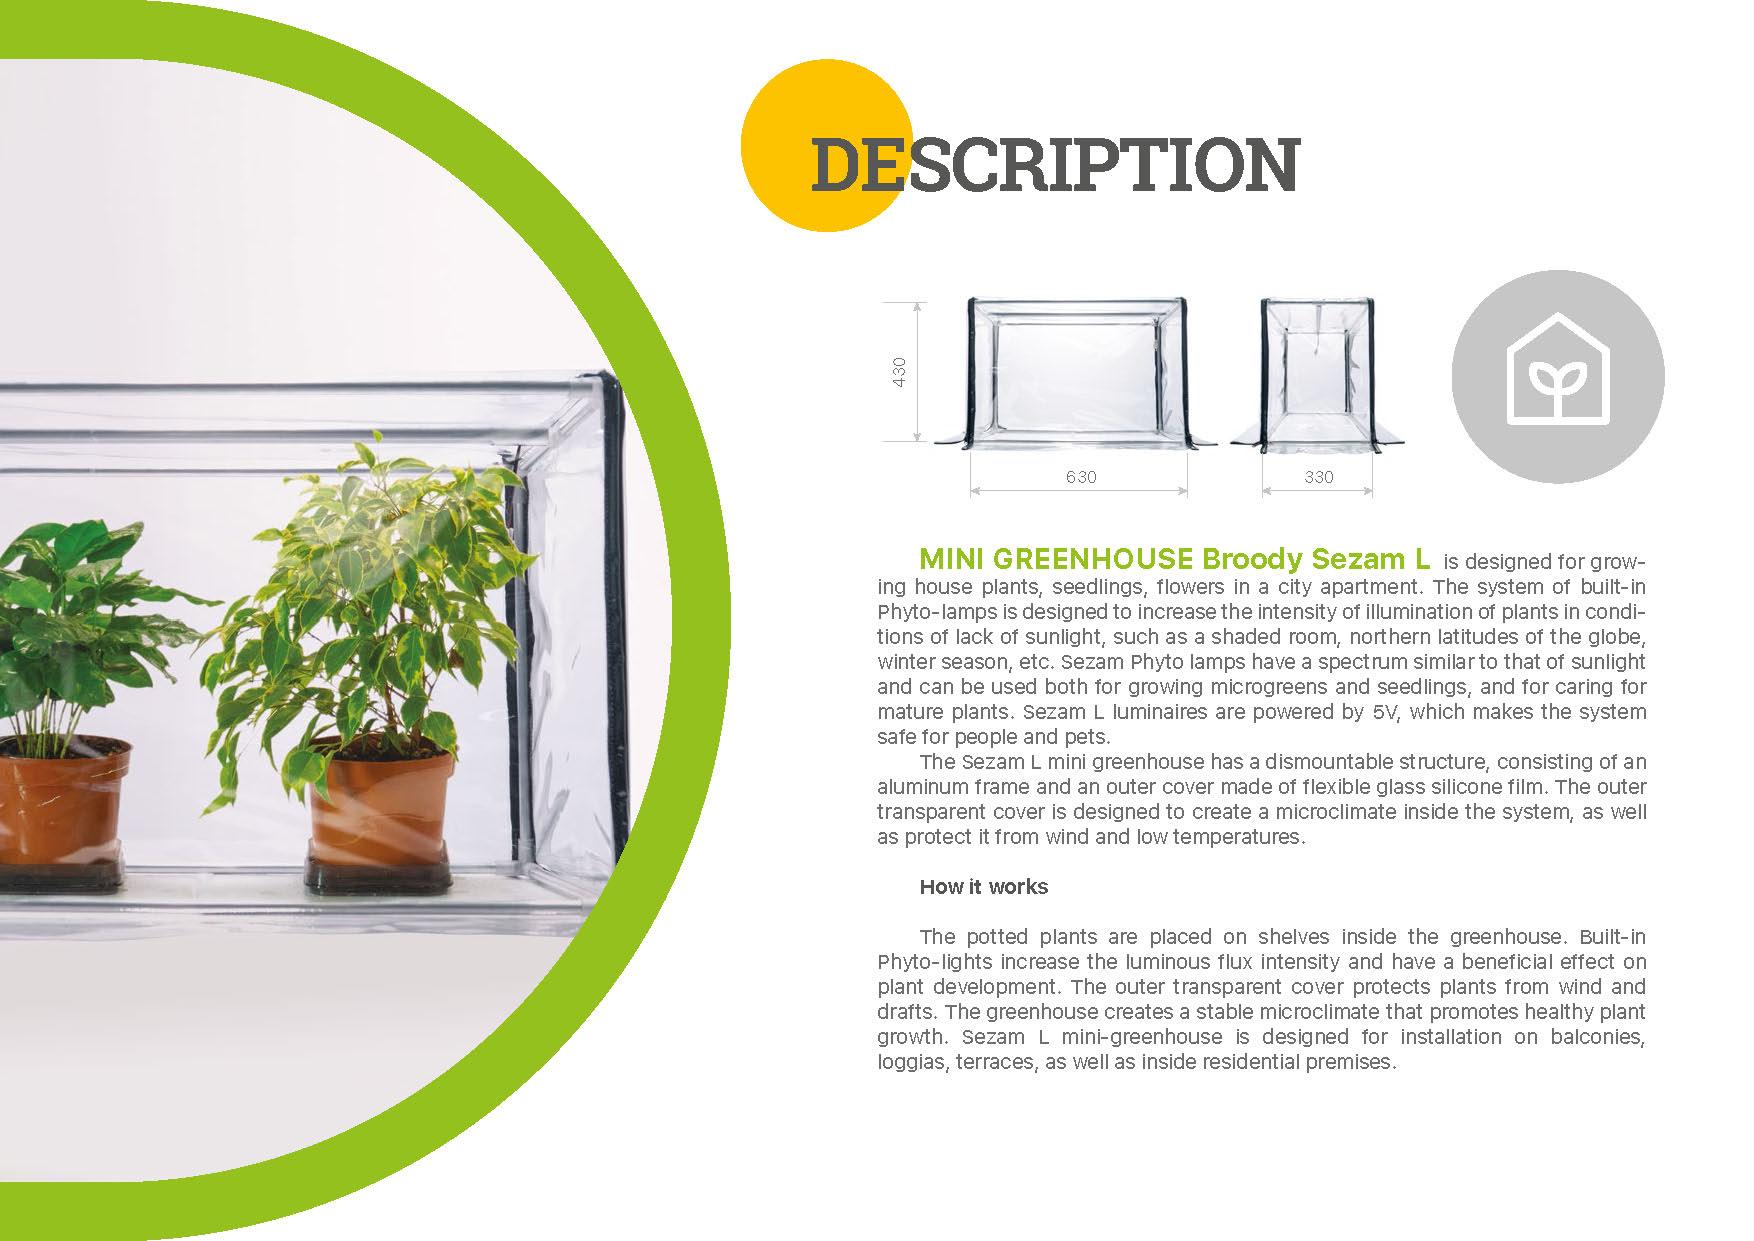 Sezam_L_home-greenhouse_2